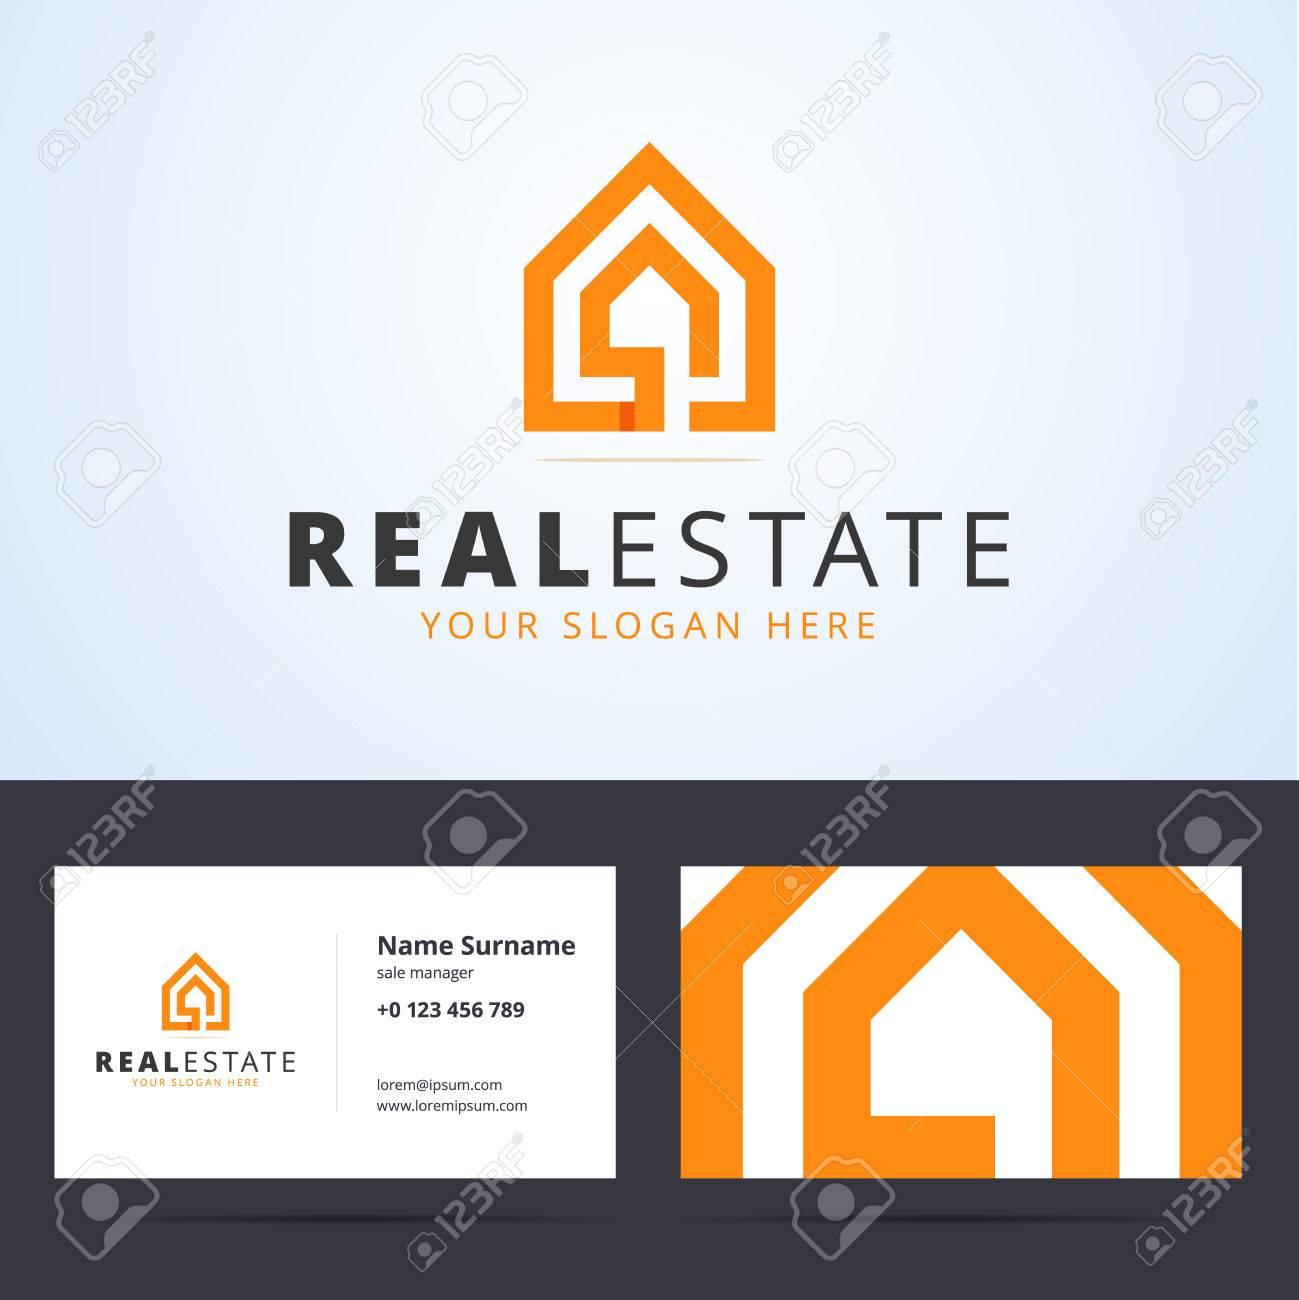 Logo Immobilire Immobilier Modle De Carte Visite Signe